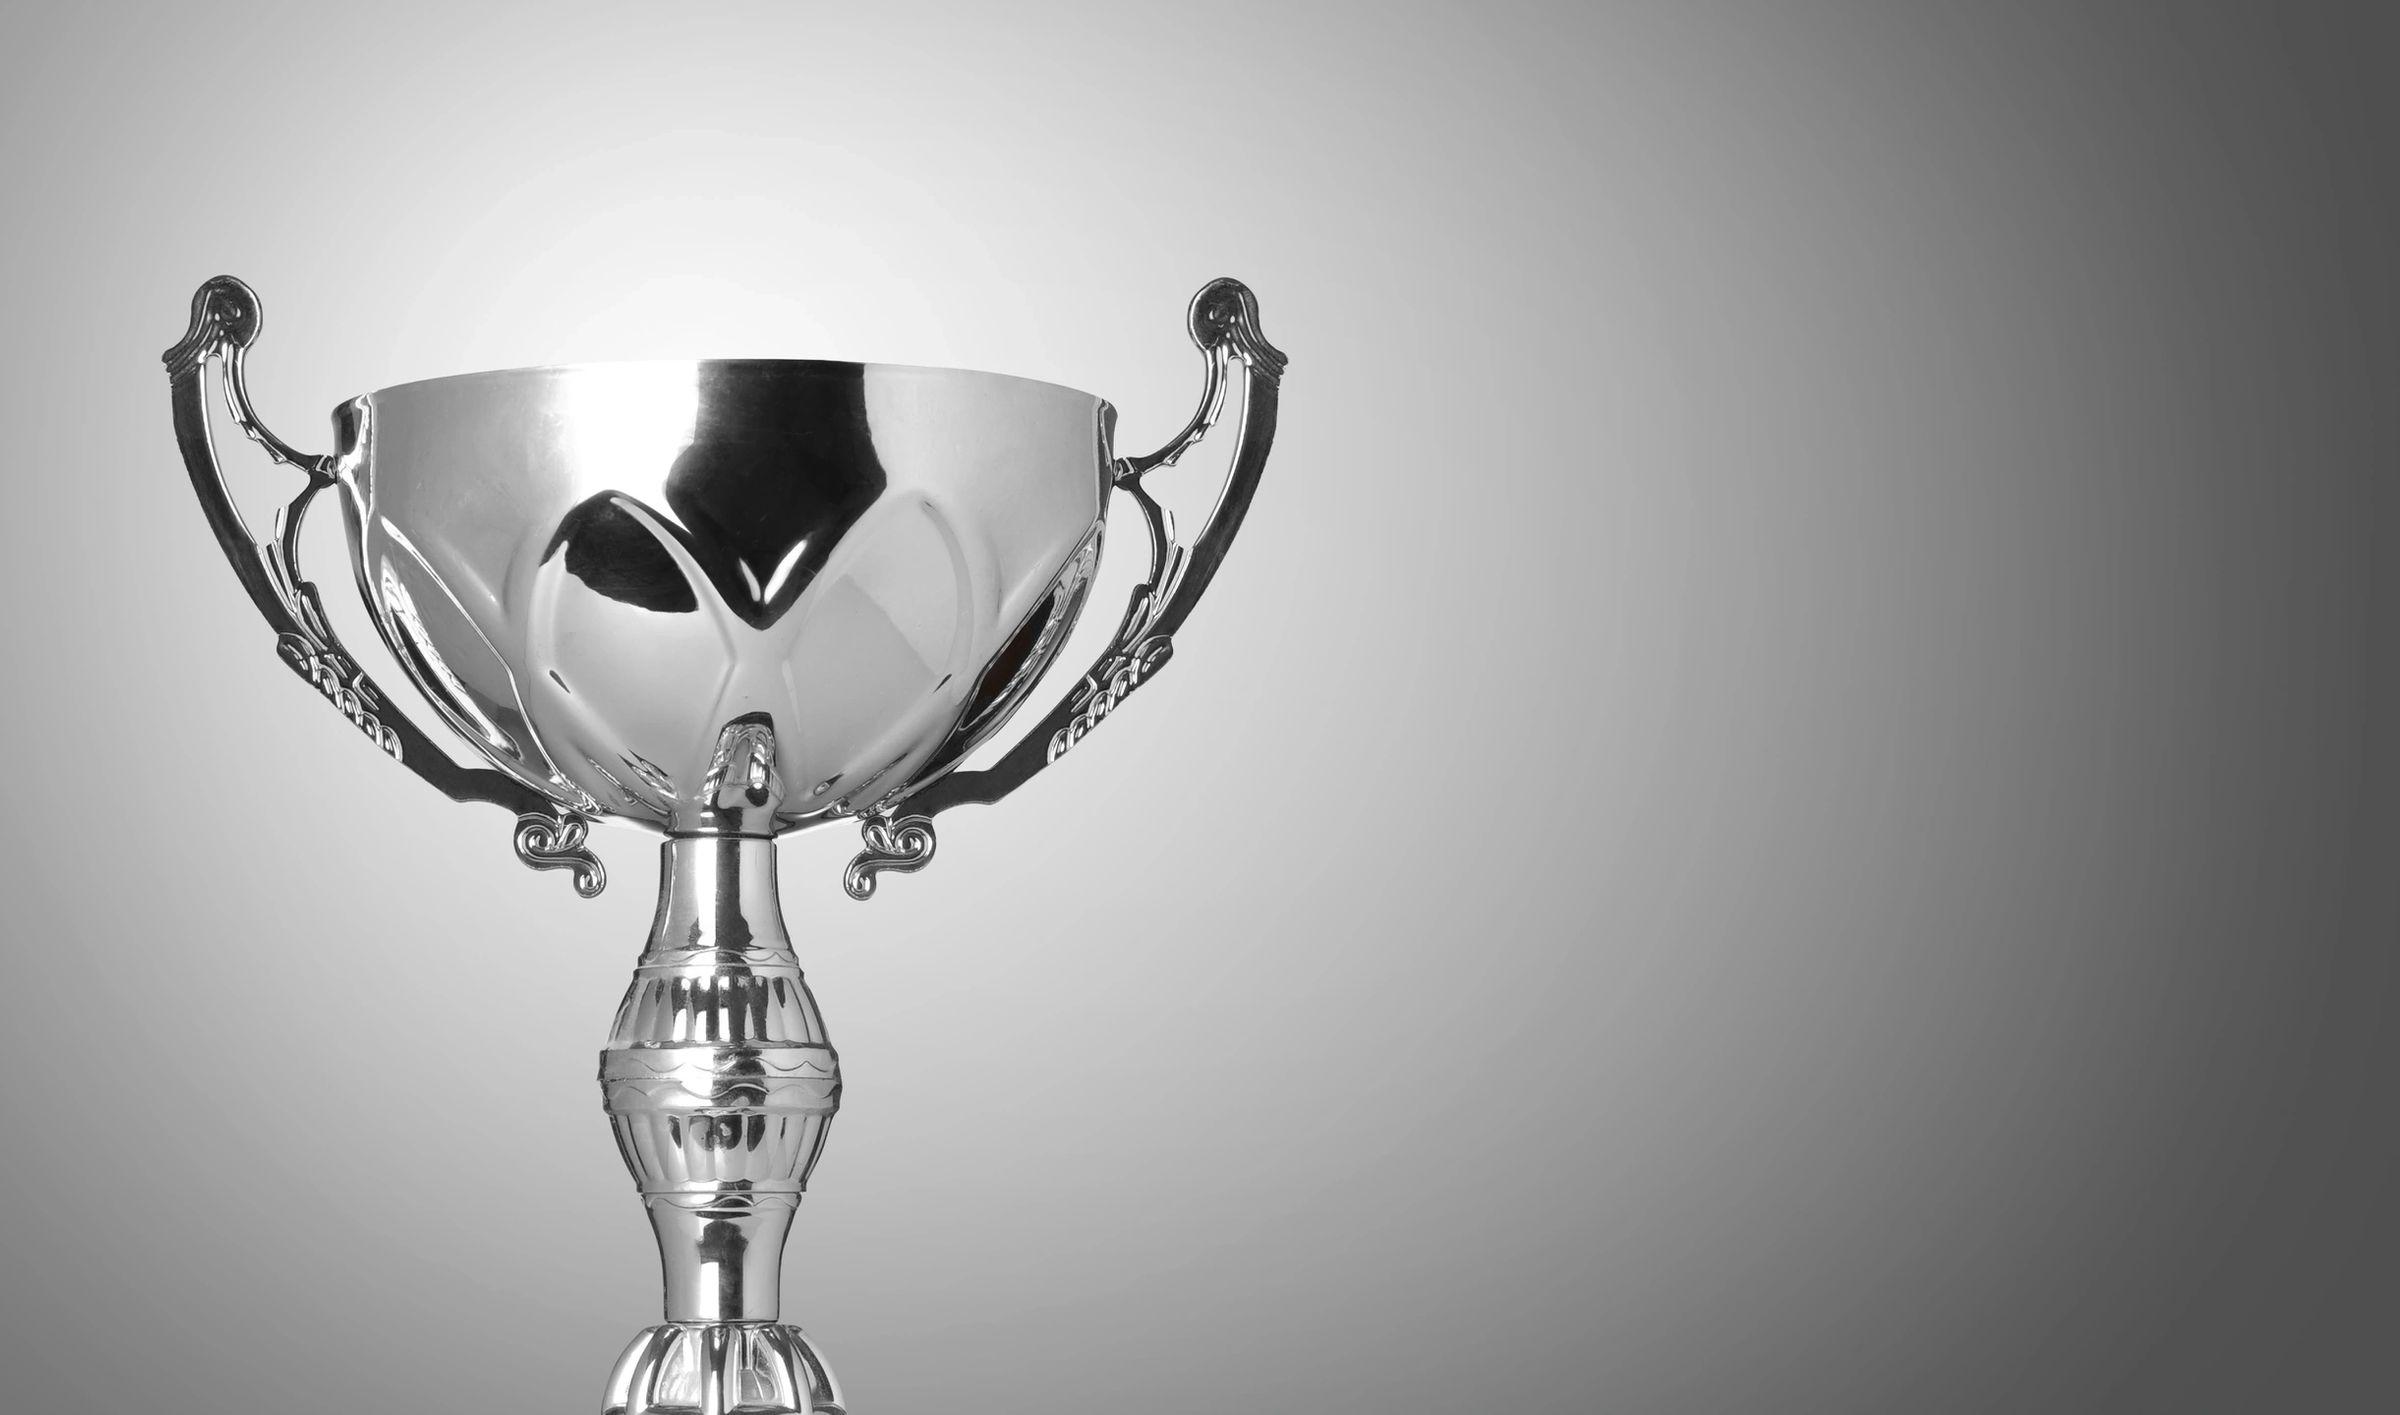 AUVSI Innovation Challenge Winner